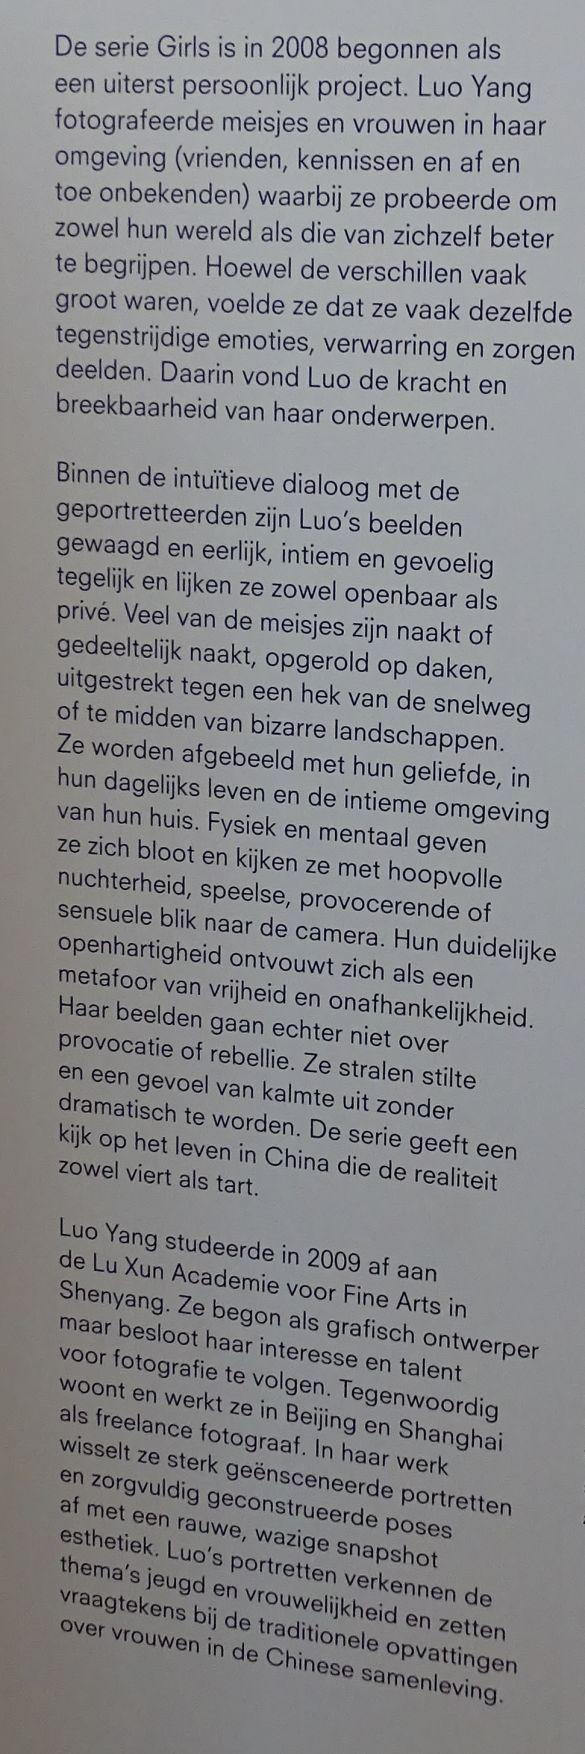 DSC03009LuoYangGirls Text Body